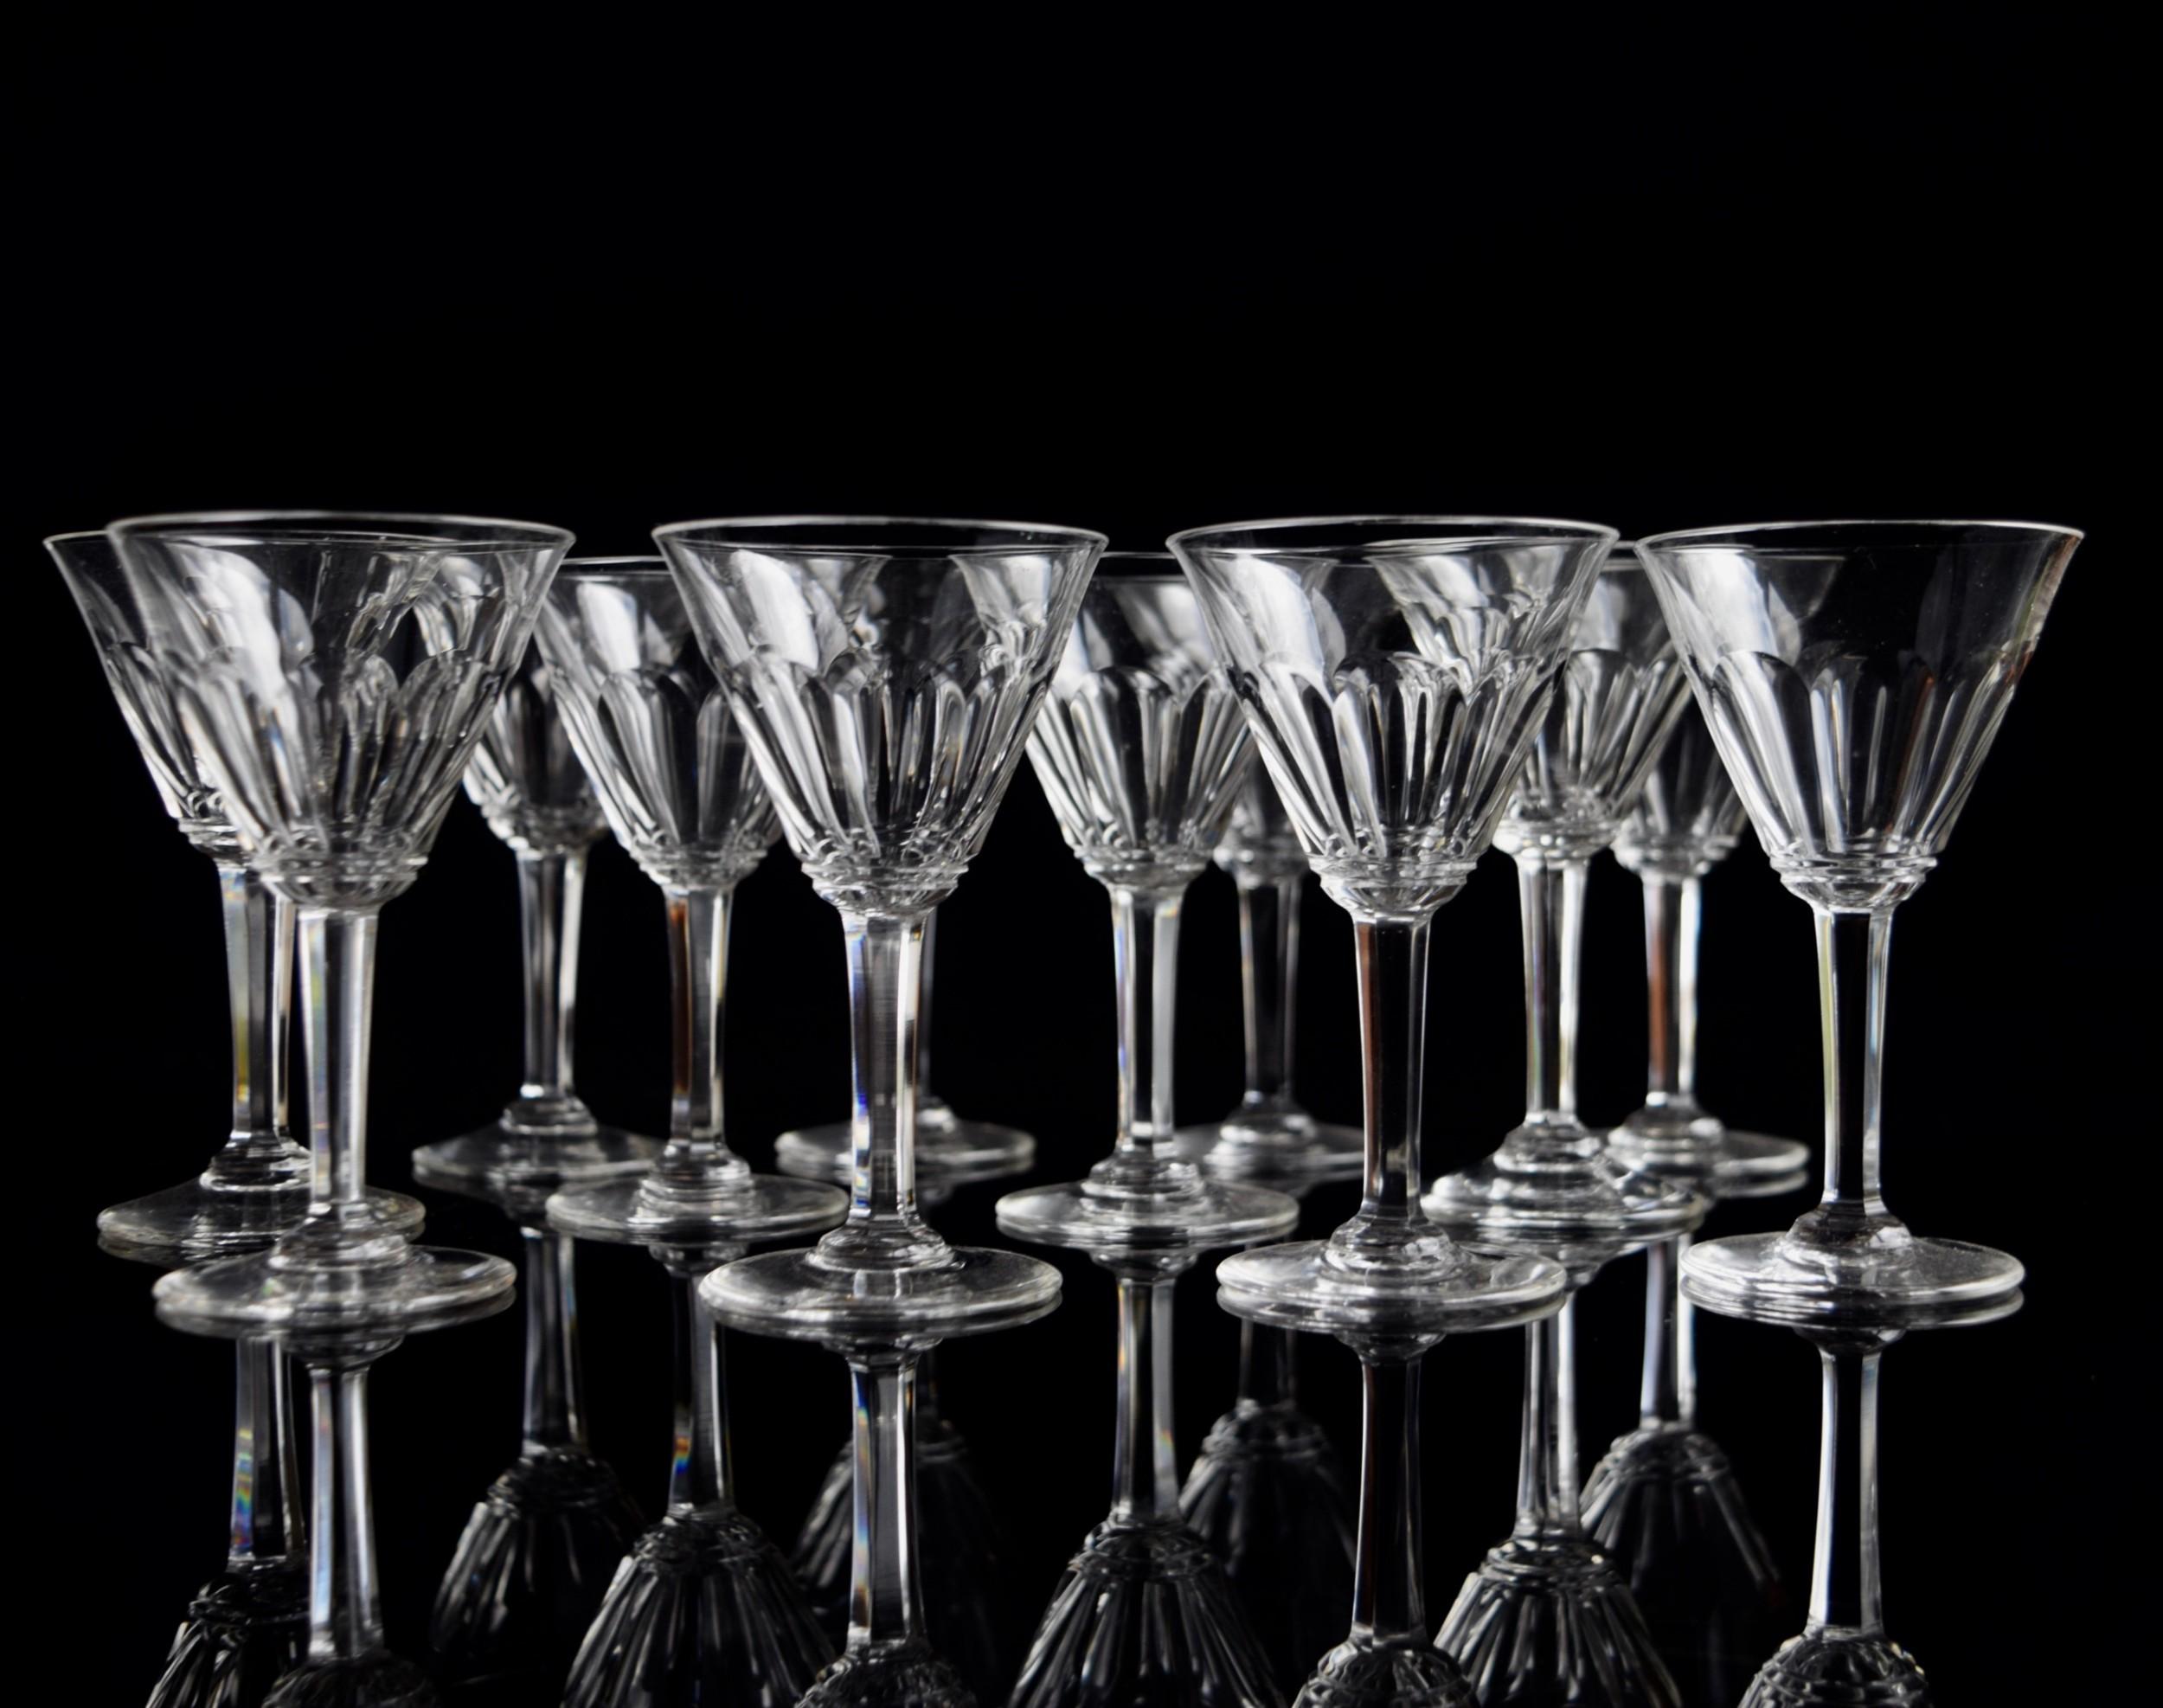 12 french port glasses c1930